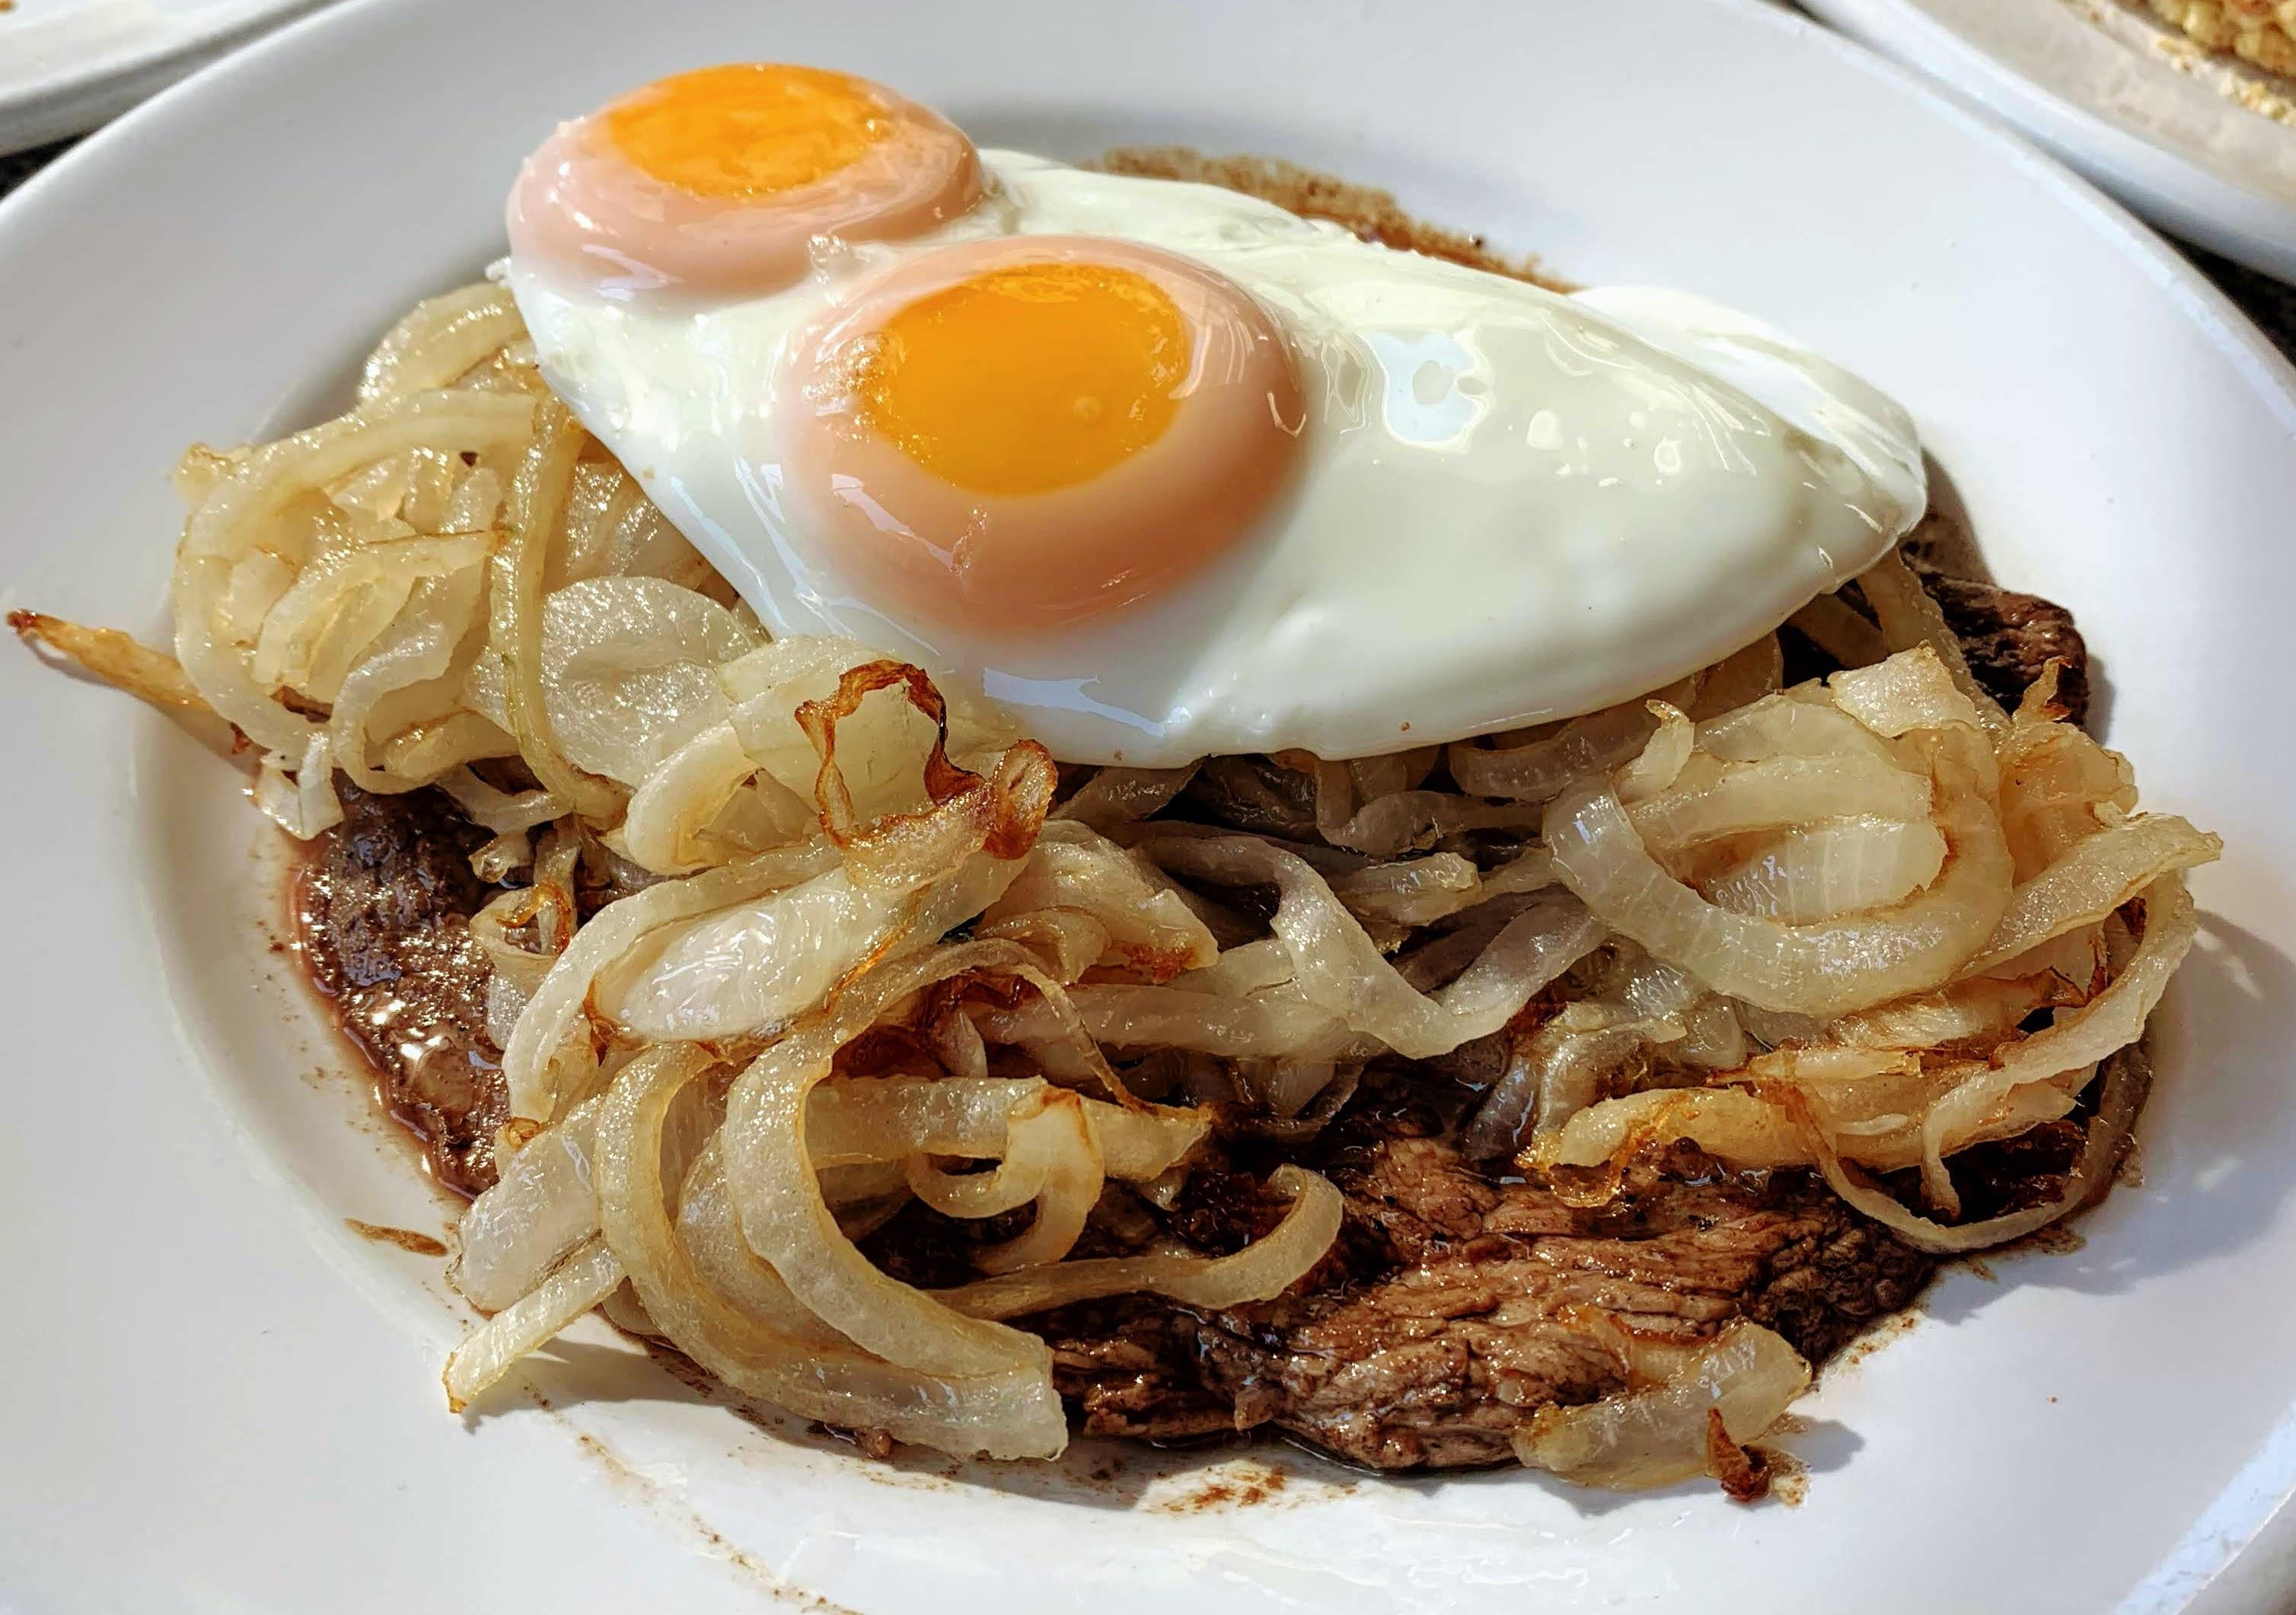 bife al caballo, traditional paraguayan breakfast dish